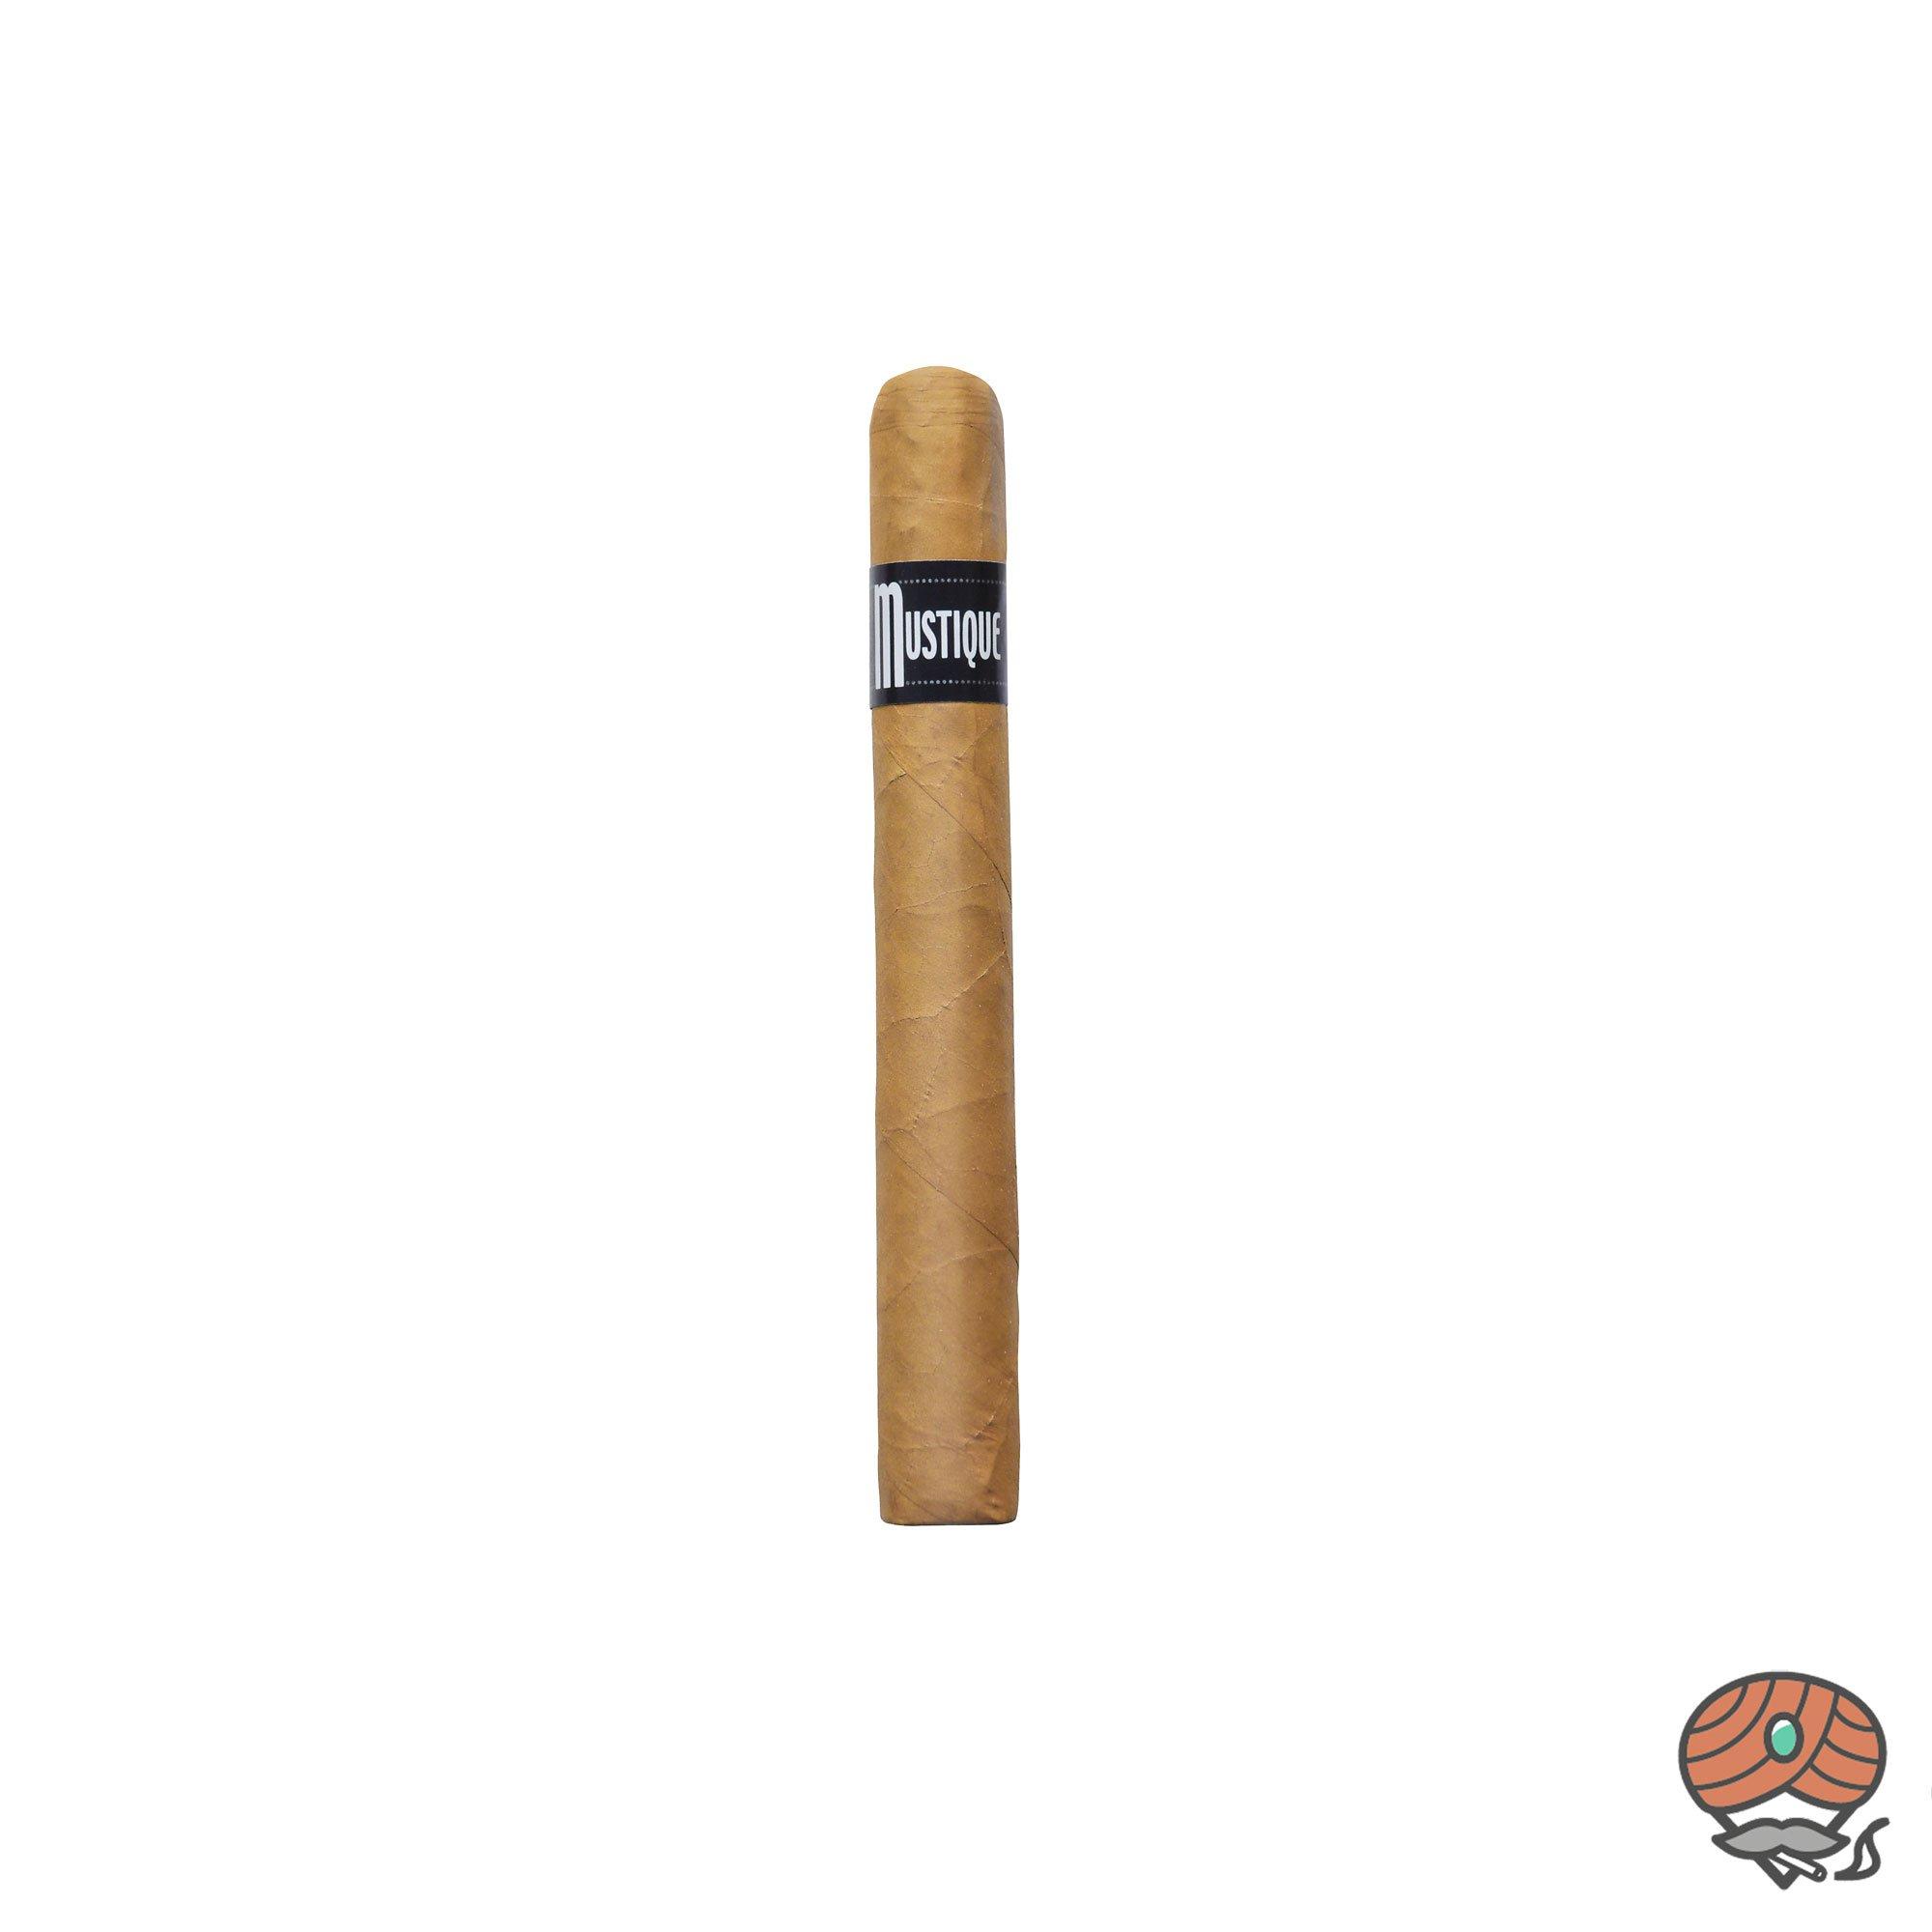 Mustique Blue Corona Zigarre Dominikanische Republik